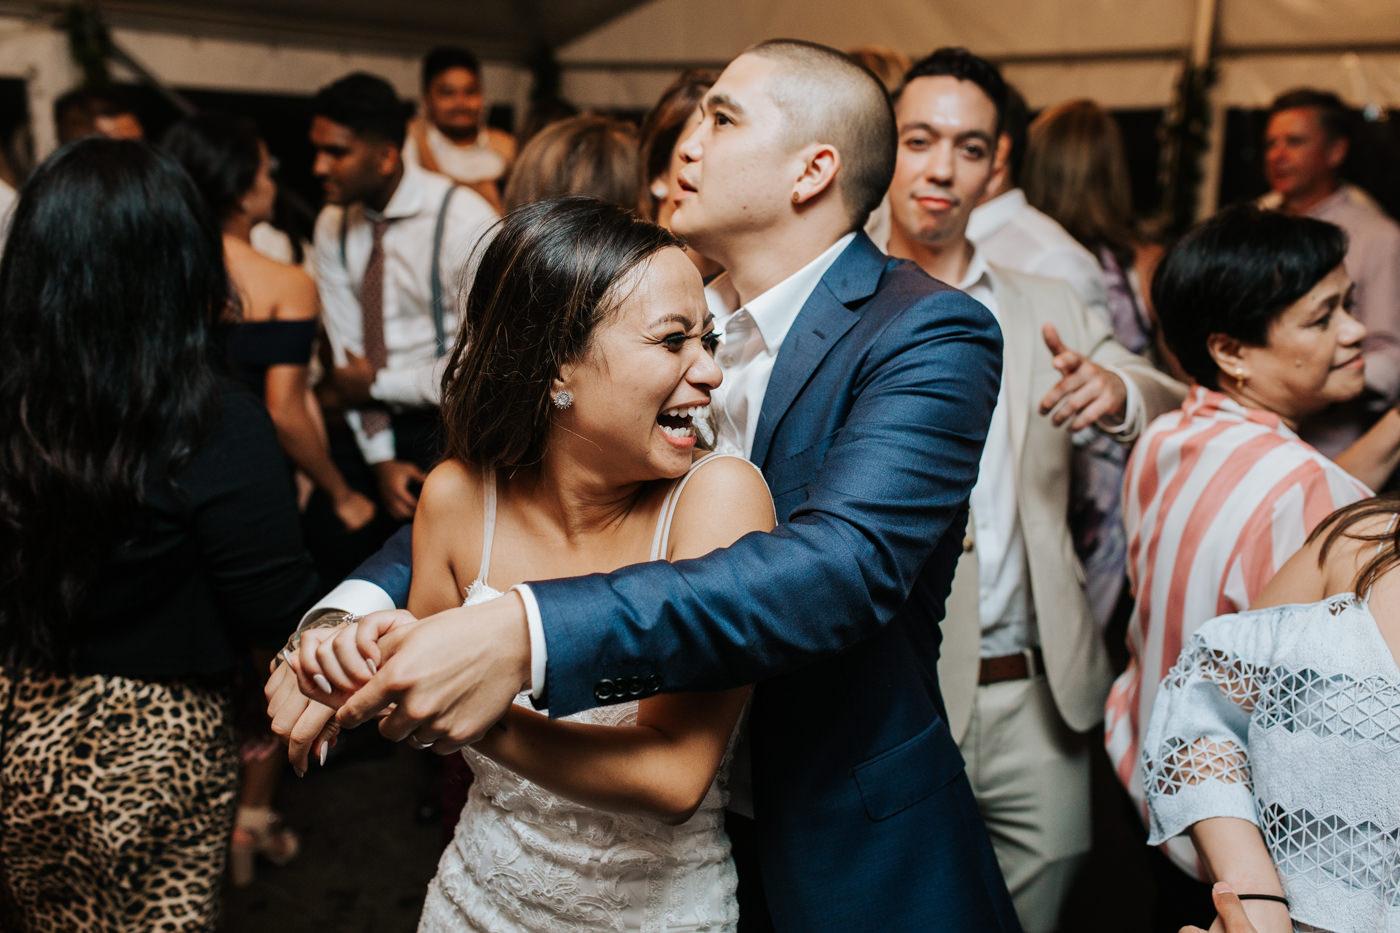 Nick & Vanezza - Fernbank Farm Wedding - Samantha Heather Photography-175.jpg